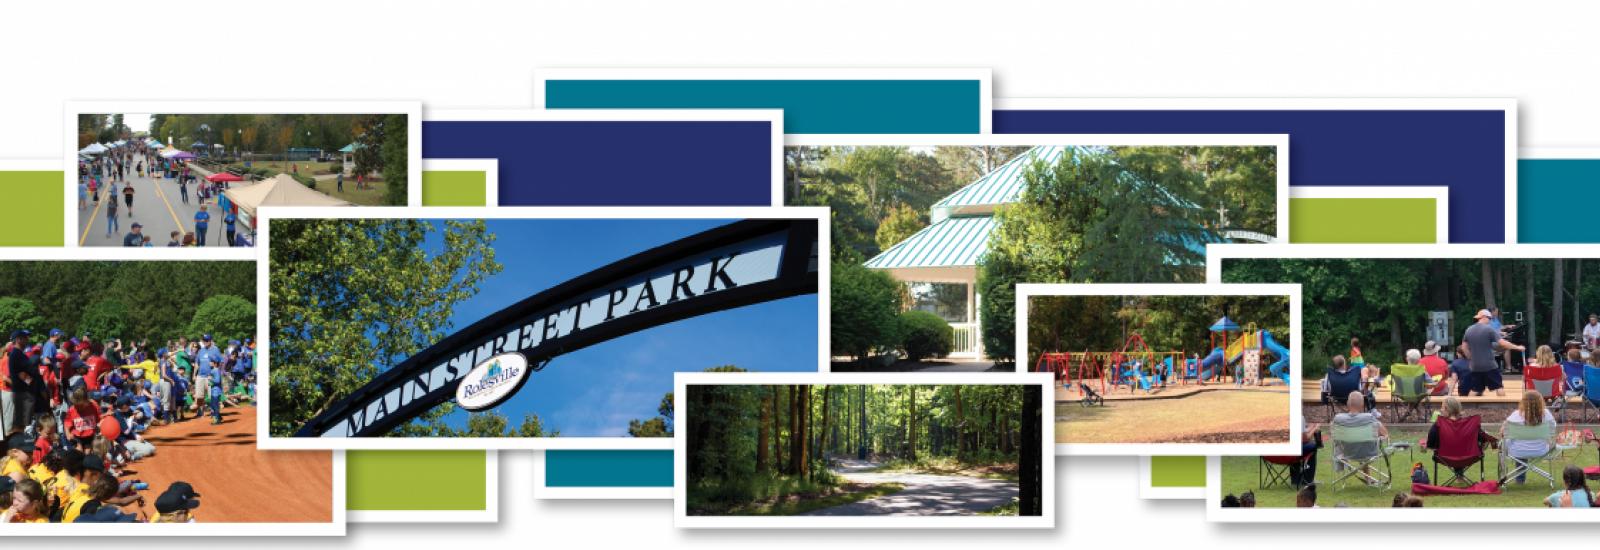 Parks and Recreation Facility Photos